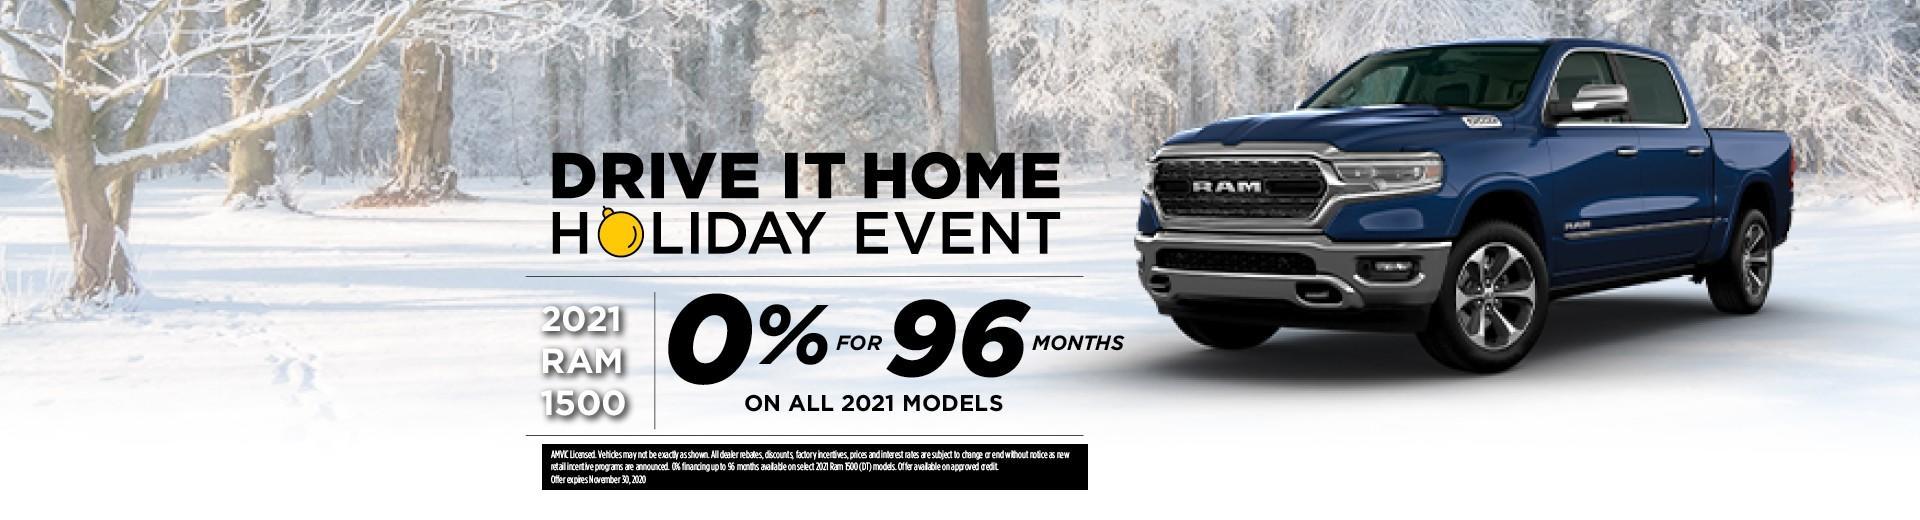 RAM Discount Offers at Crosstown Chrysler Dodge Jeep Ram in Edmonton